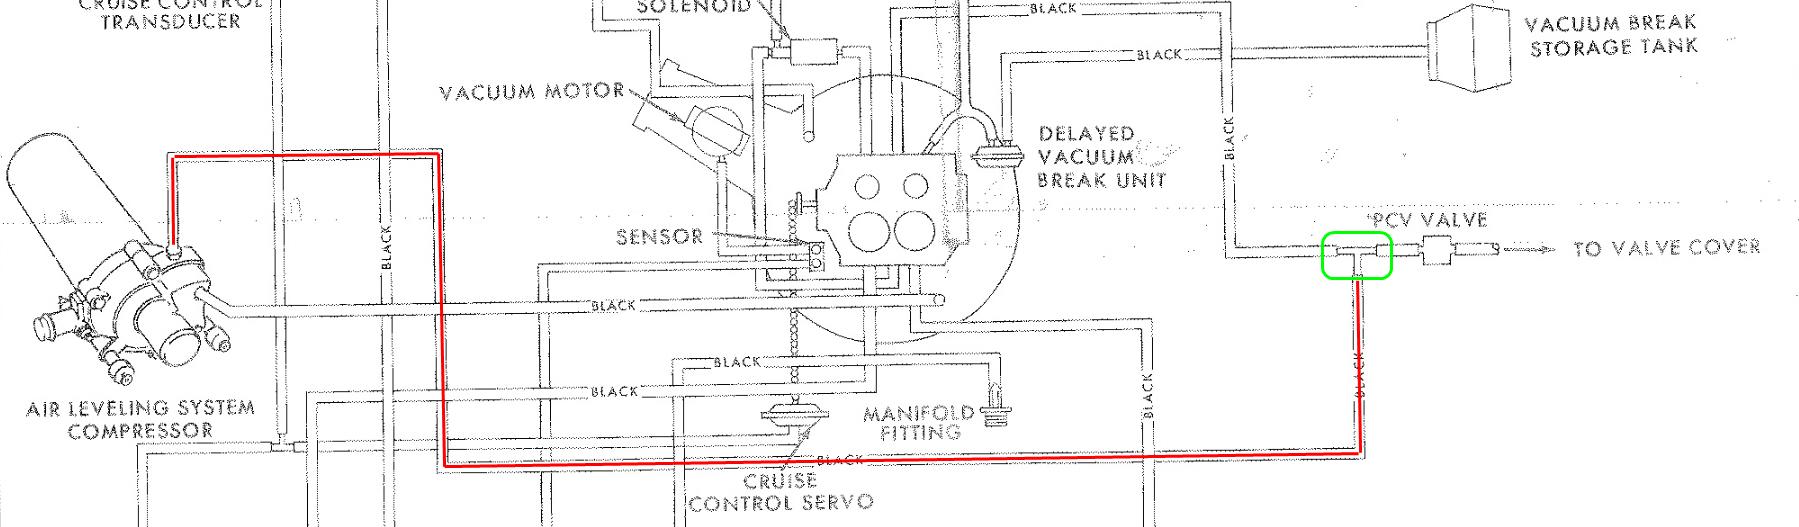 1956 Cadillac Vacuum Diagram Great Installation Of Wiring Catera 3 0 Engine 1968 Eldorado Air Ride Automatic Level Control Questions Rh Forums Cadillaclasalleclub Org Intake Hose 1995